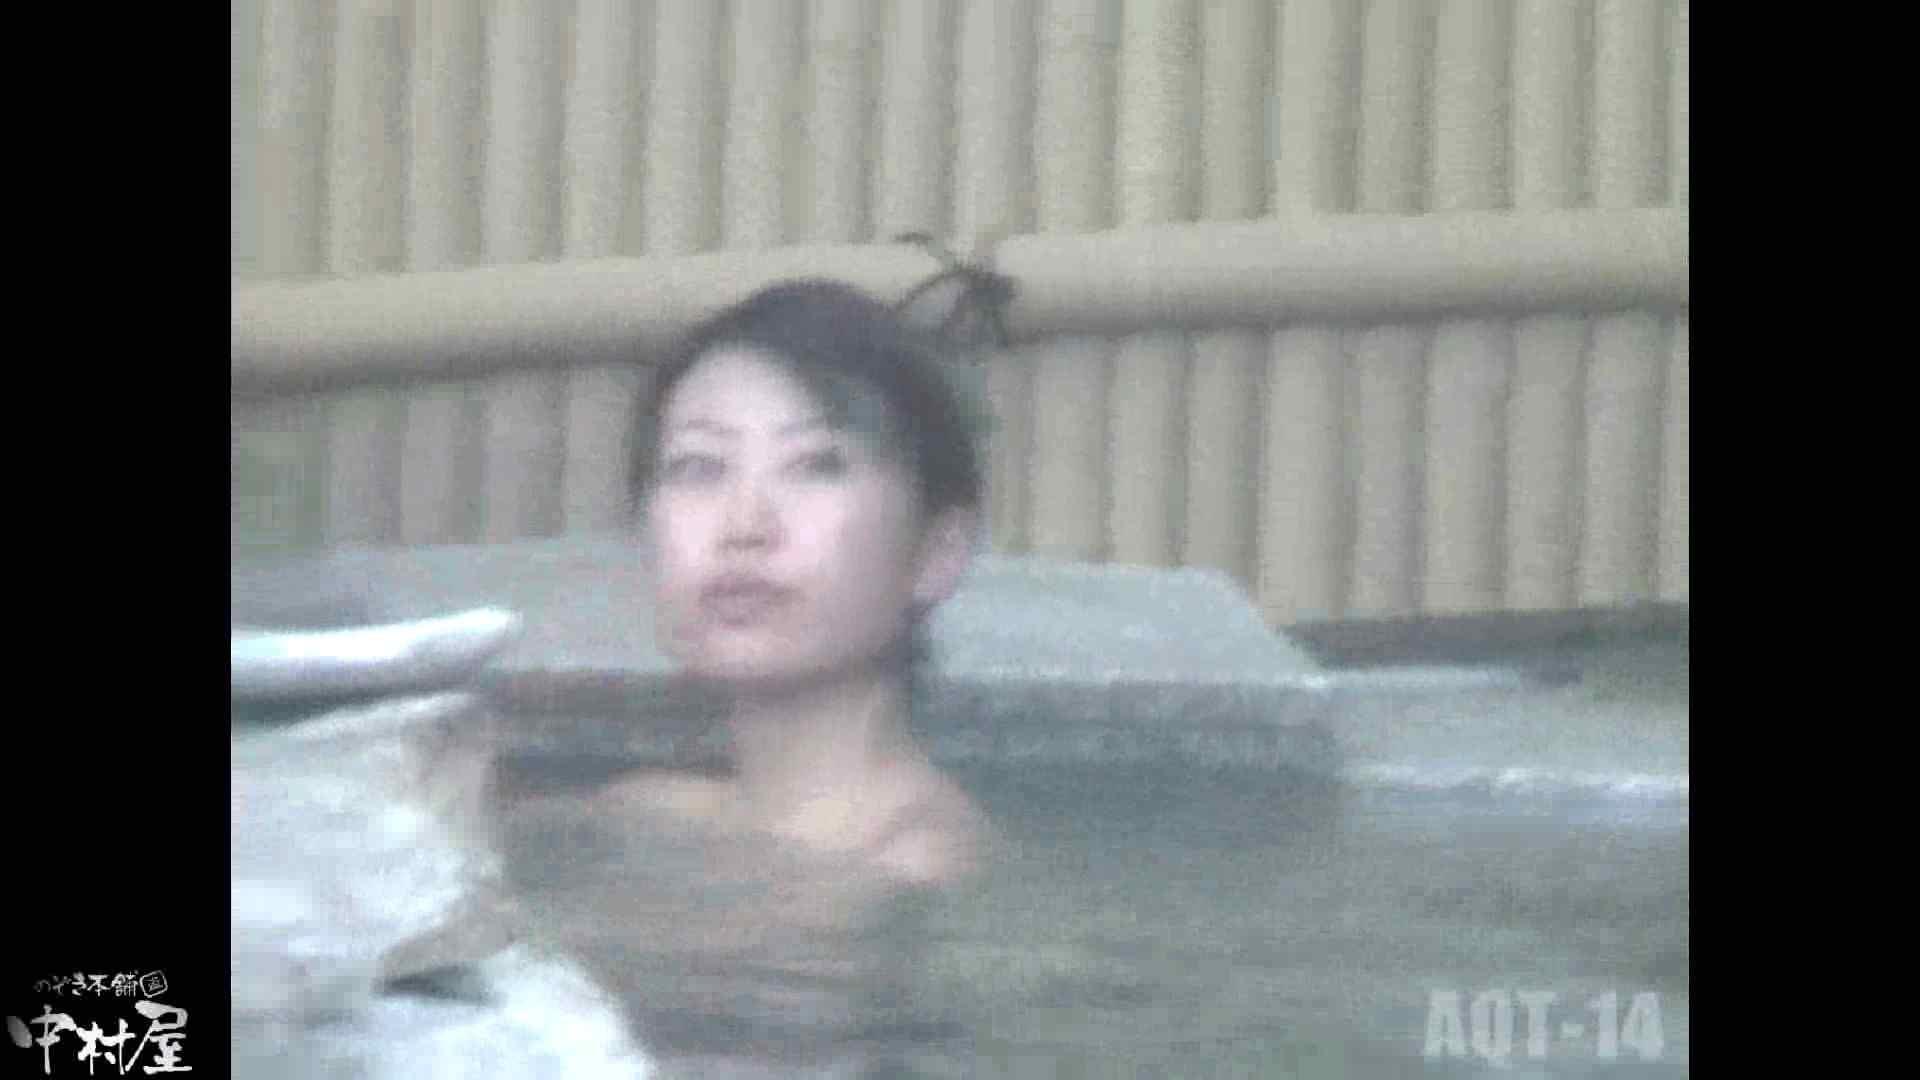 Aquaな露天風呂Vol.878潜入盗撮露天風呂十四判湯 其の一 潜入 AV無料動画キャプチャ 79PIX 11